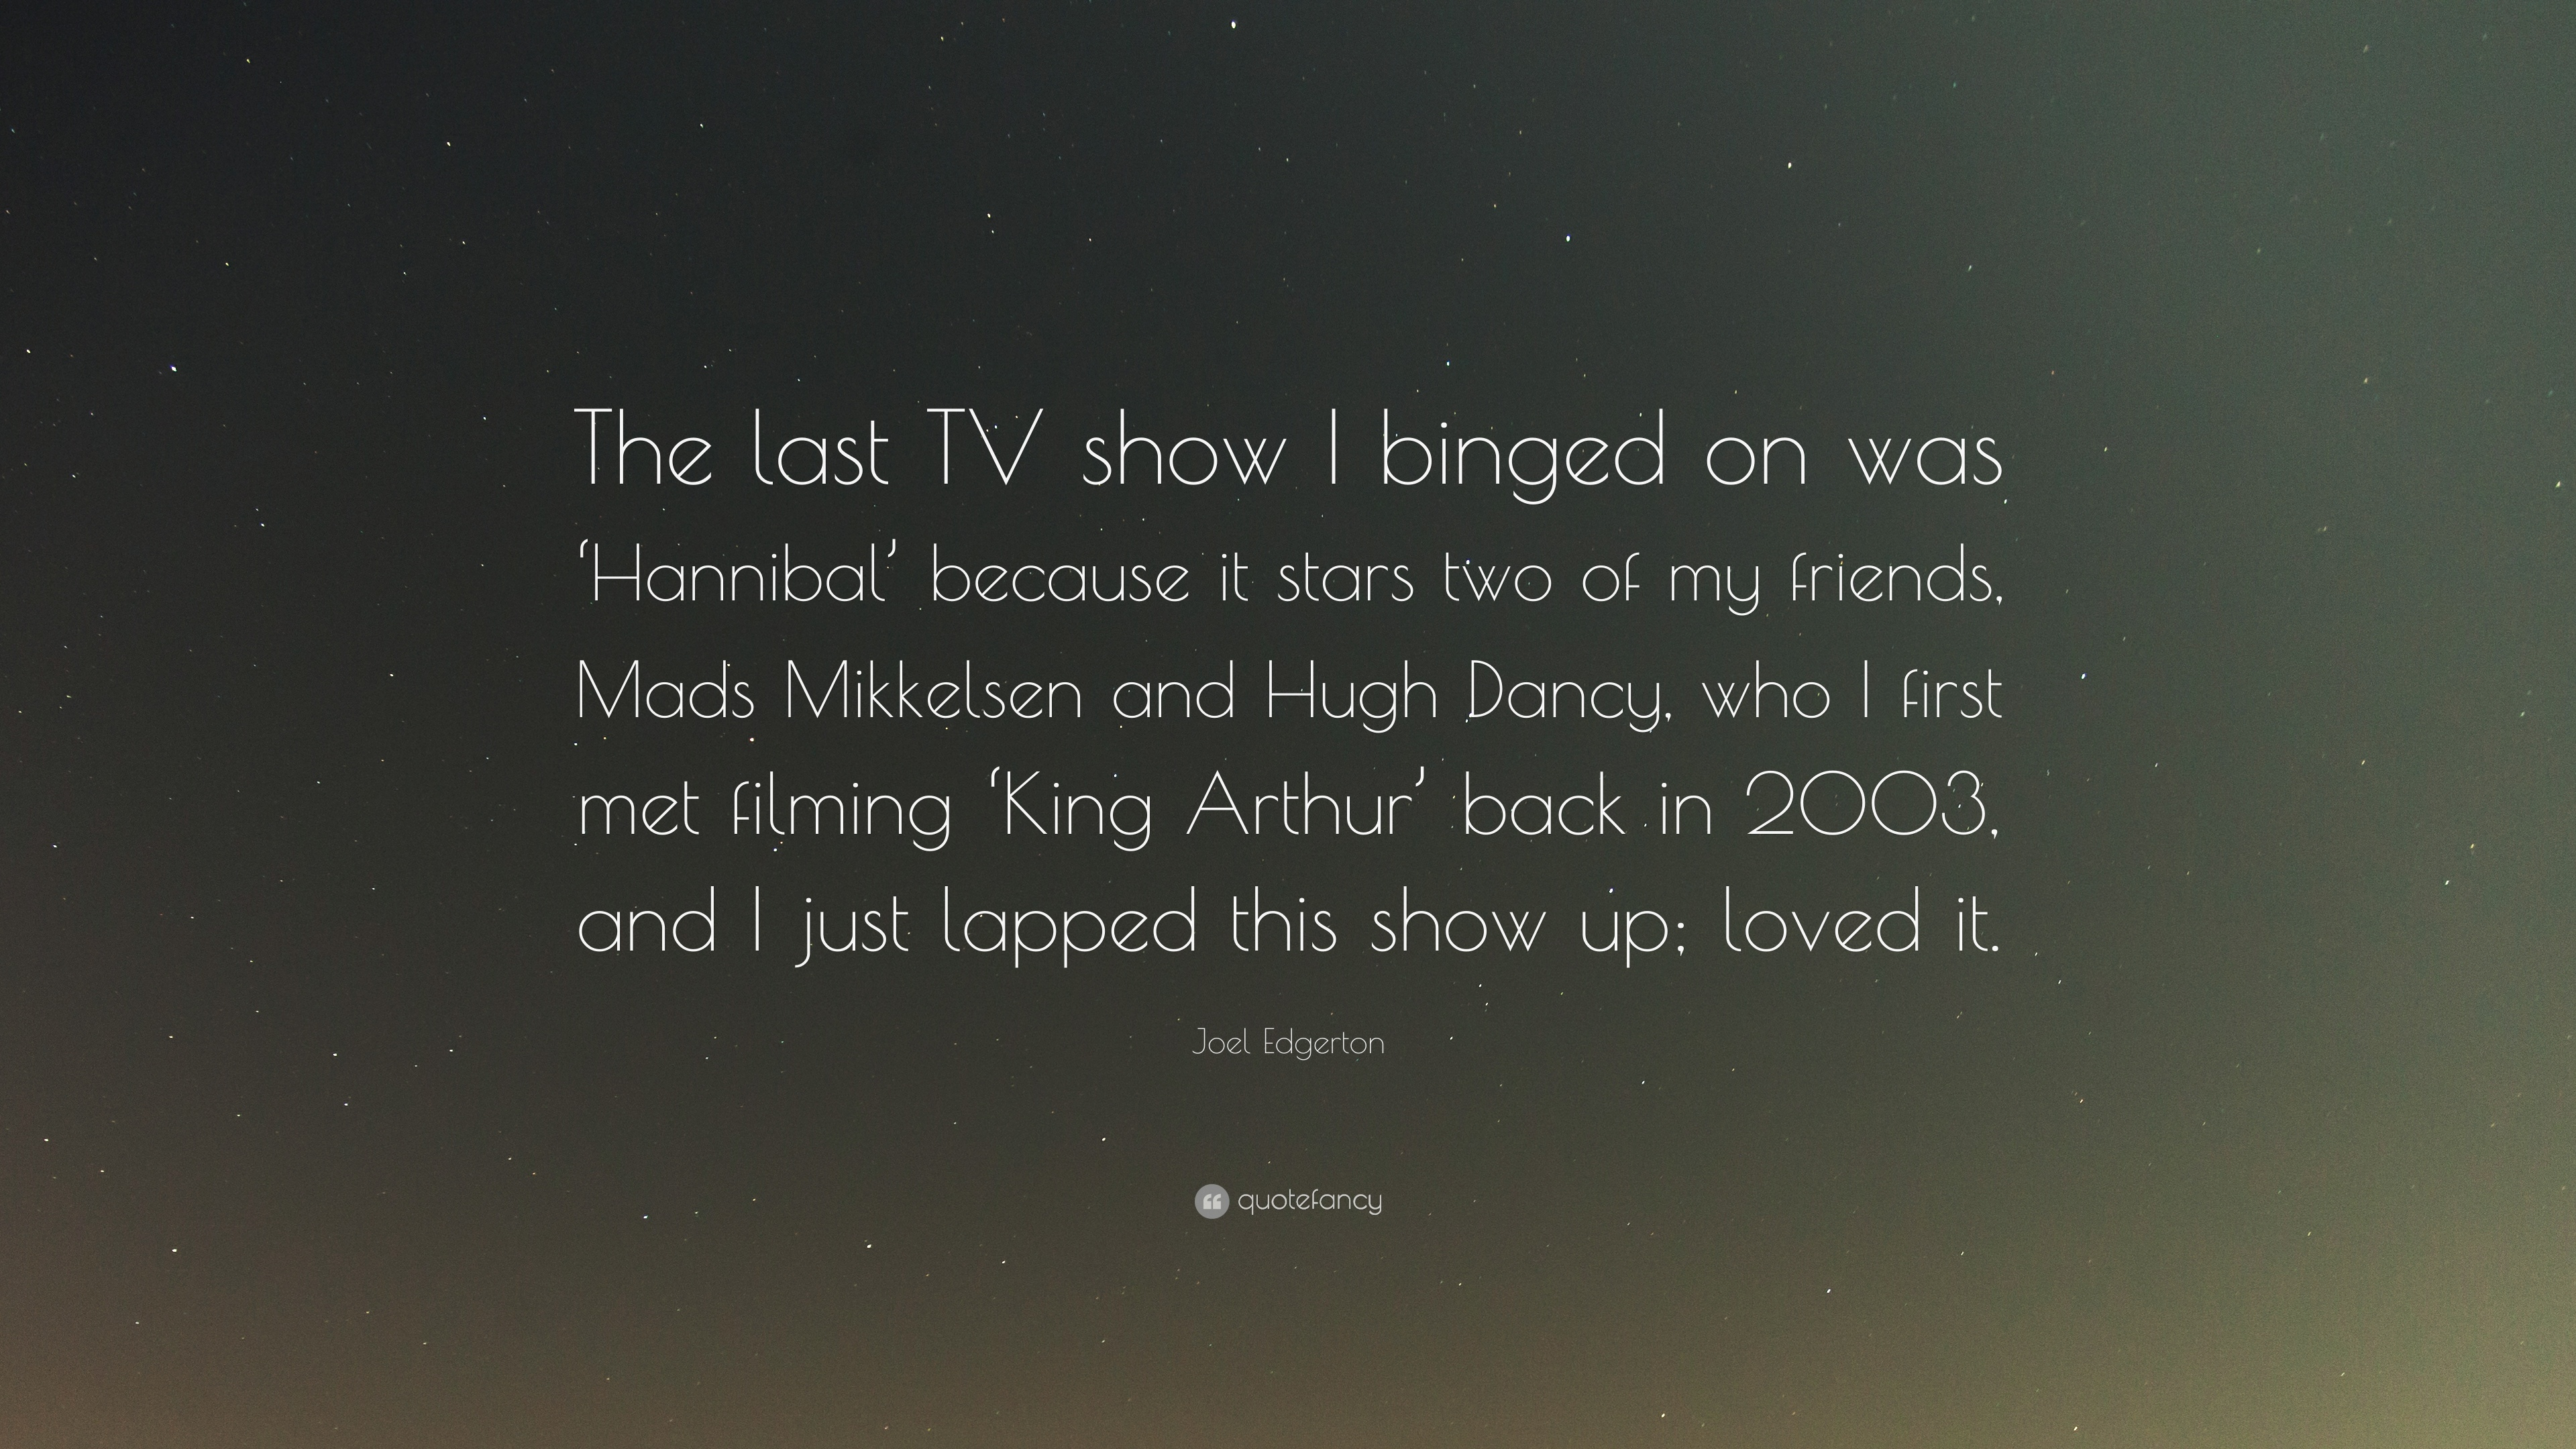 Joel Edgerton Quote The Last TV Show I Binged On Was Hannibal